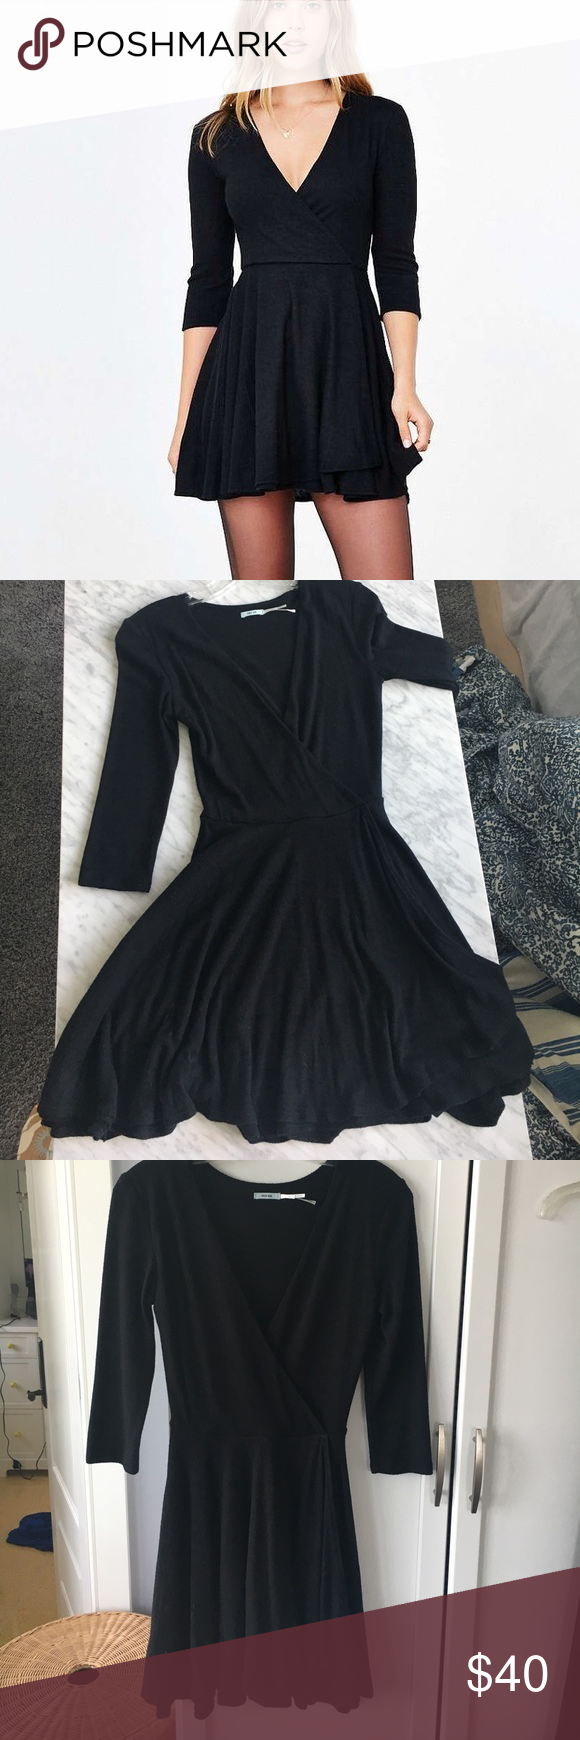 Urban outfitters black wrap dress negotiable wrap dresses